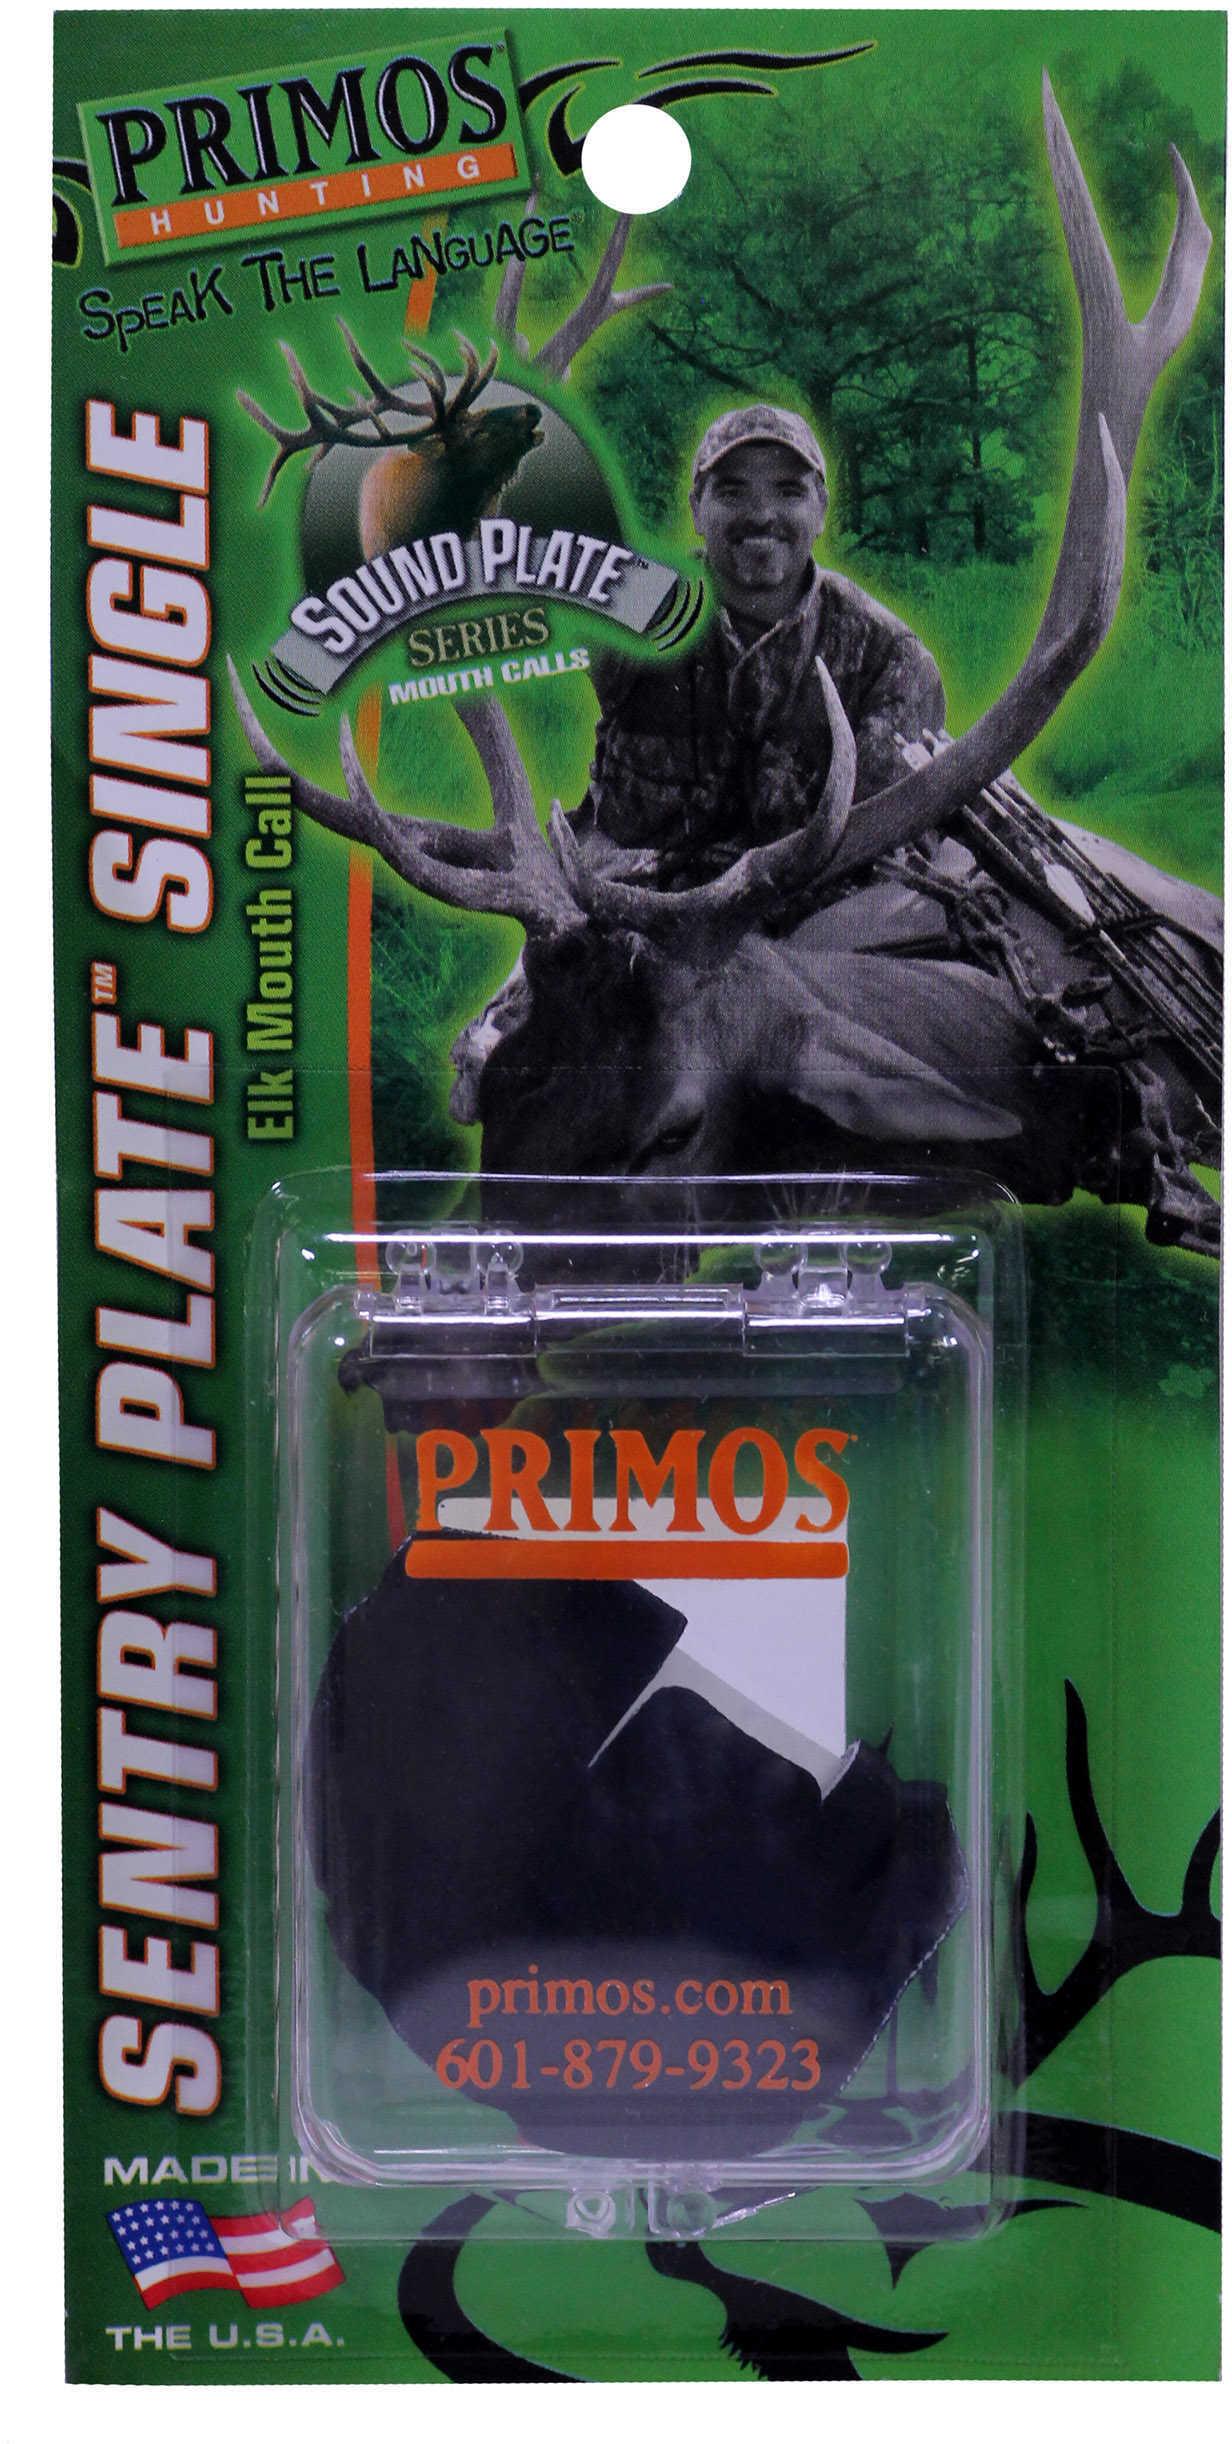 Primos Sentry Plate Single Md: 158